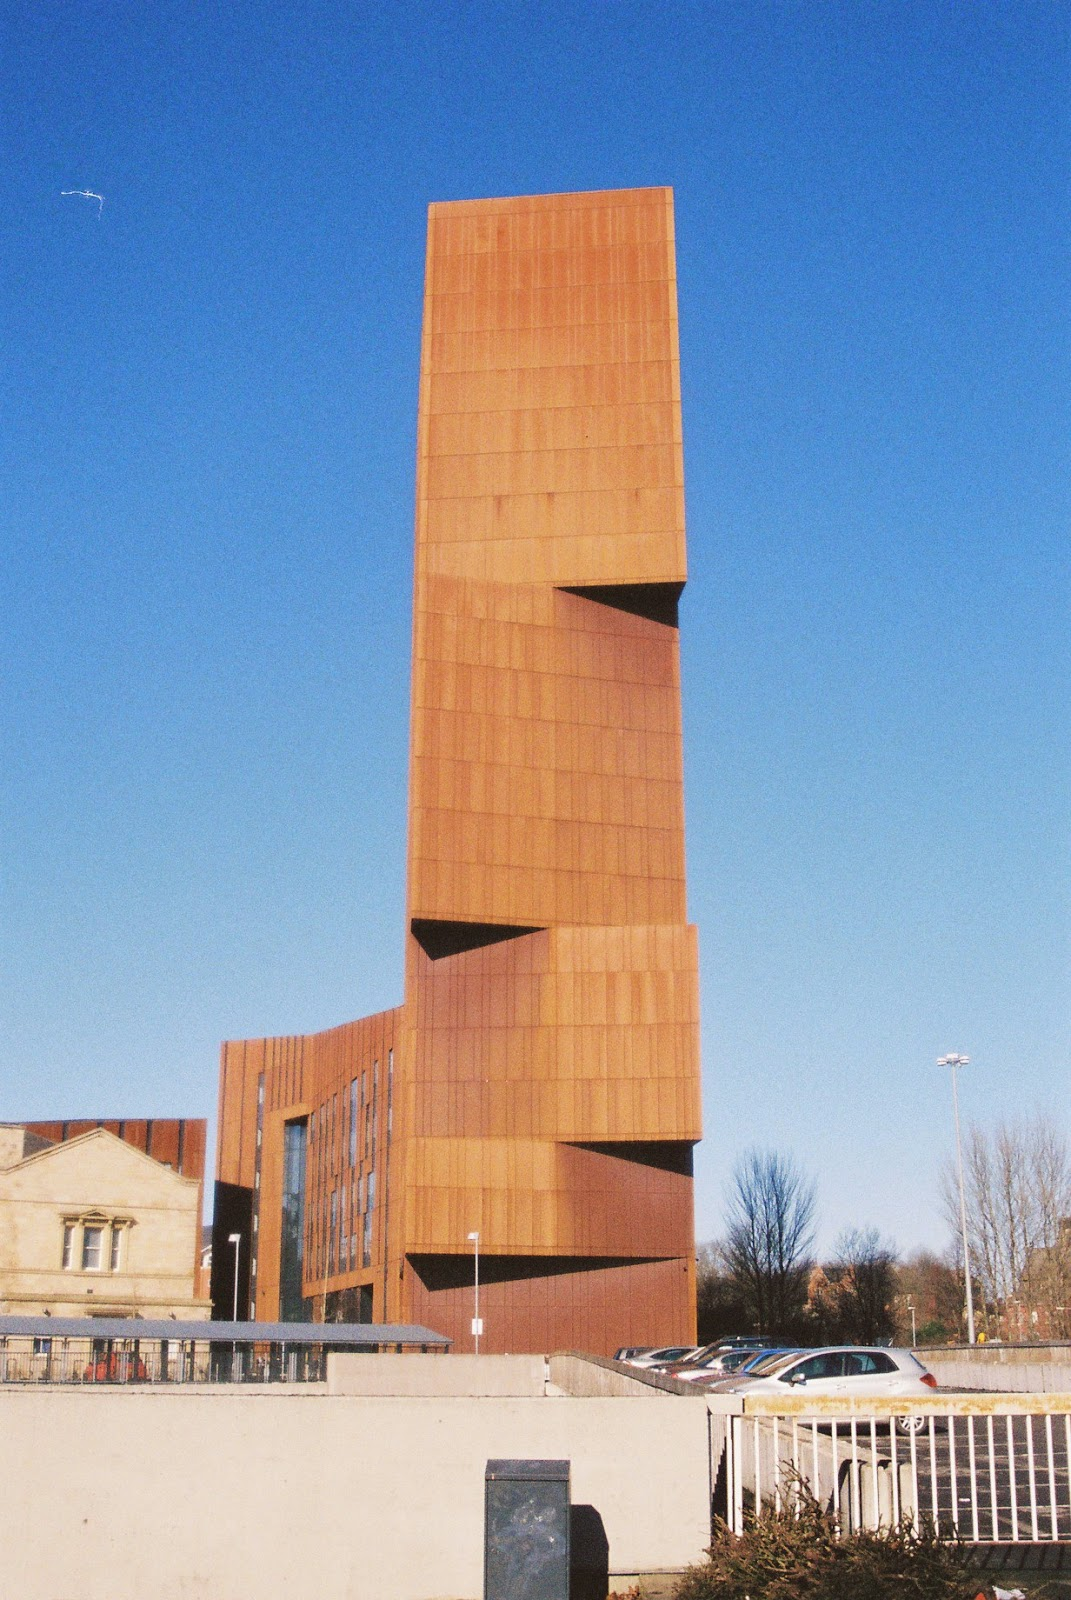 Broadcasting tower, Leeds, Pentax P30, Lomo Colour negative